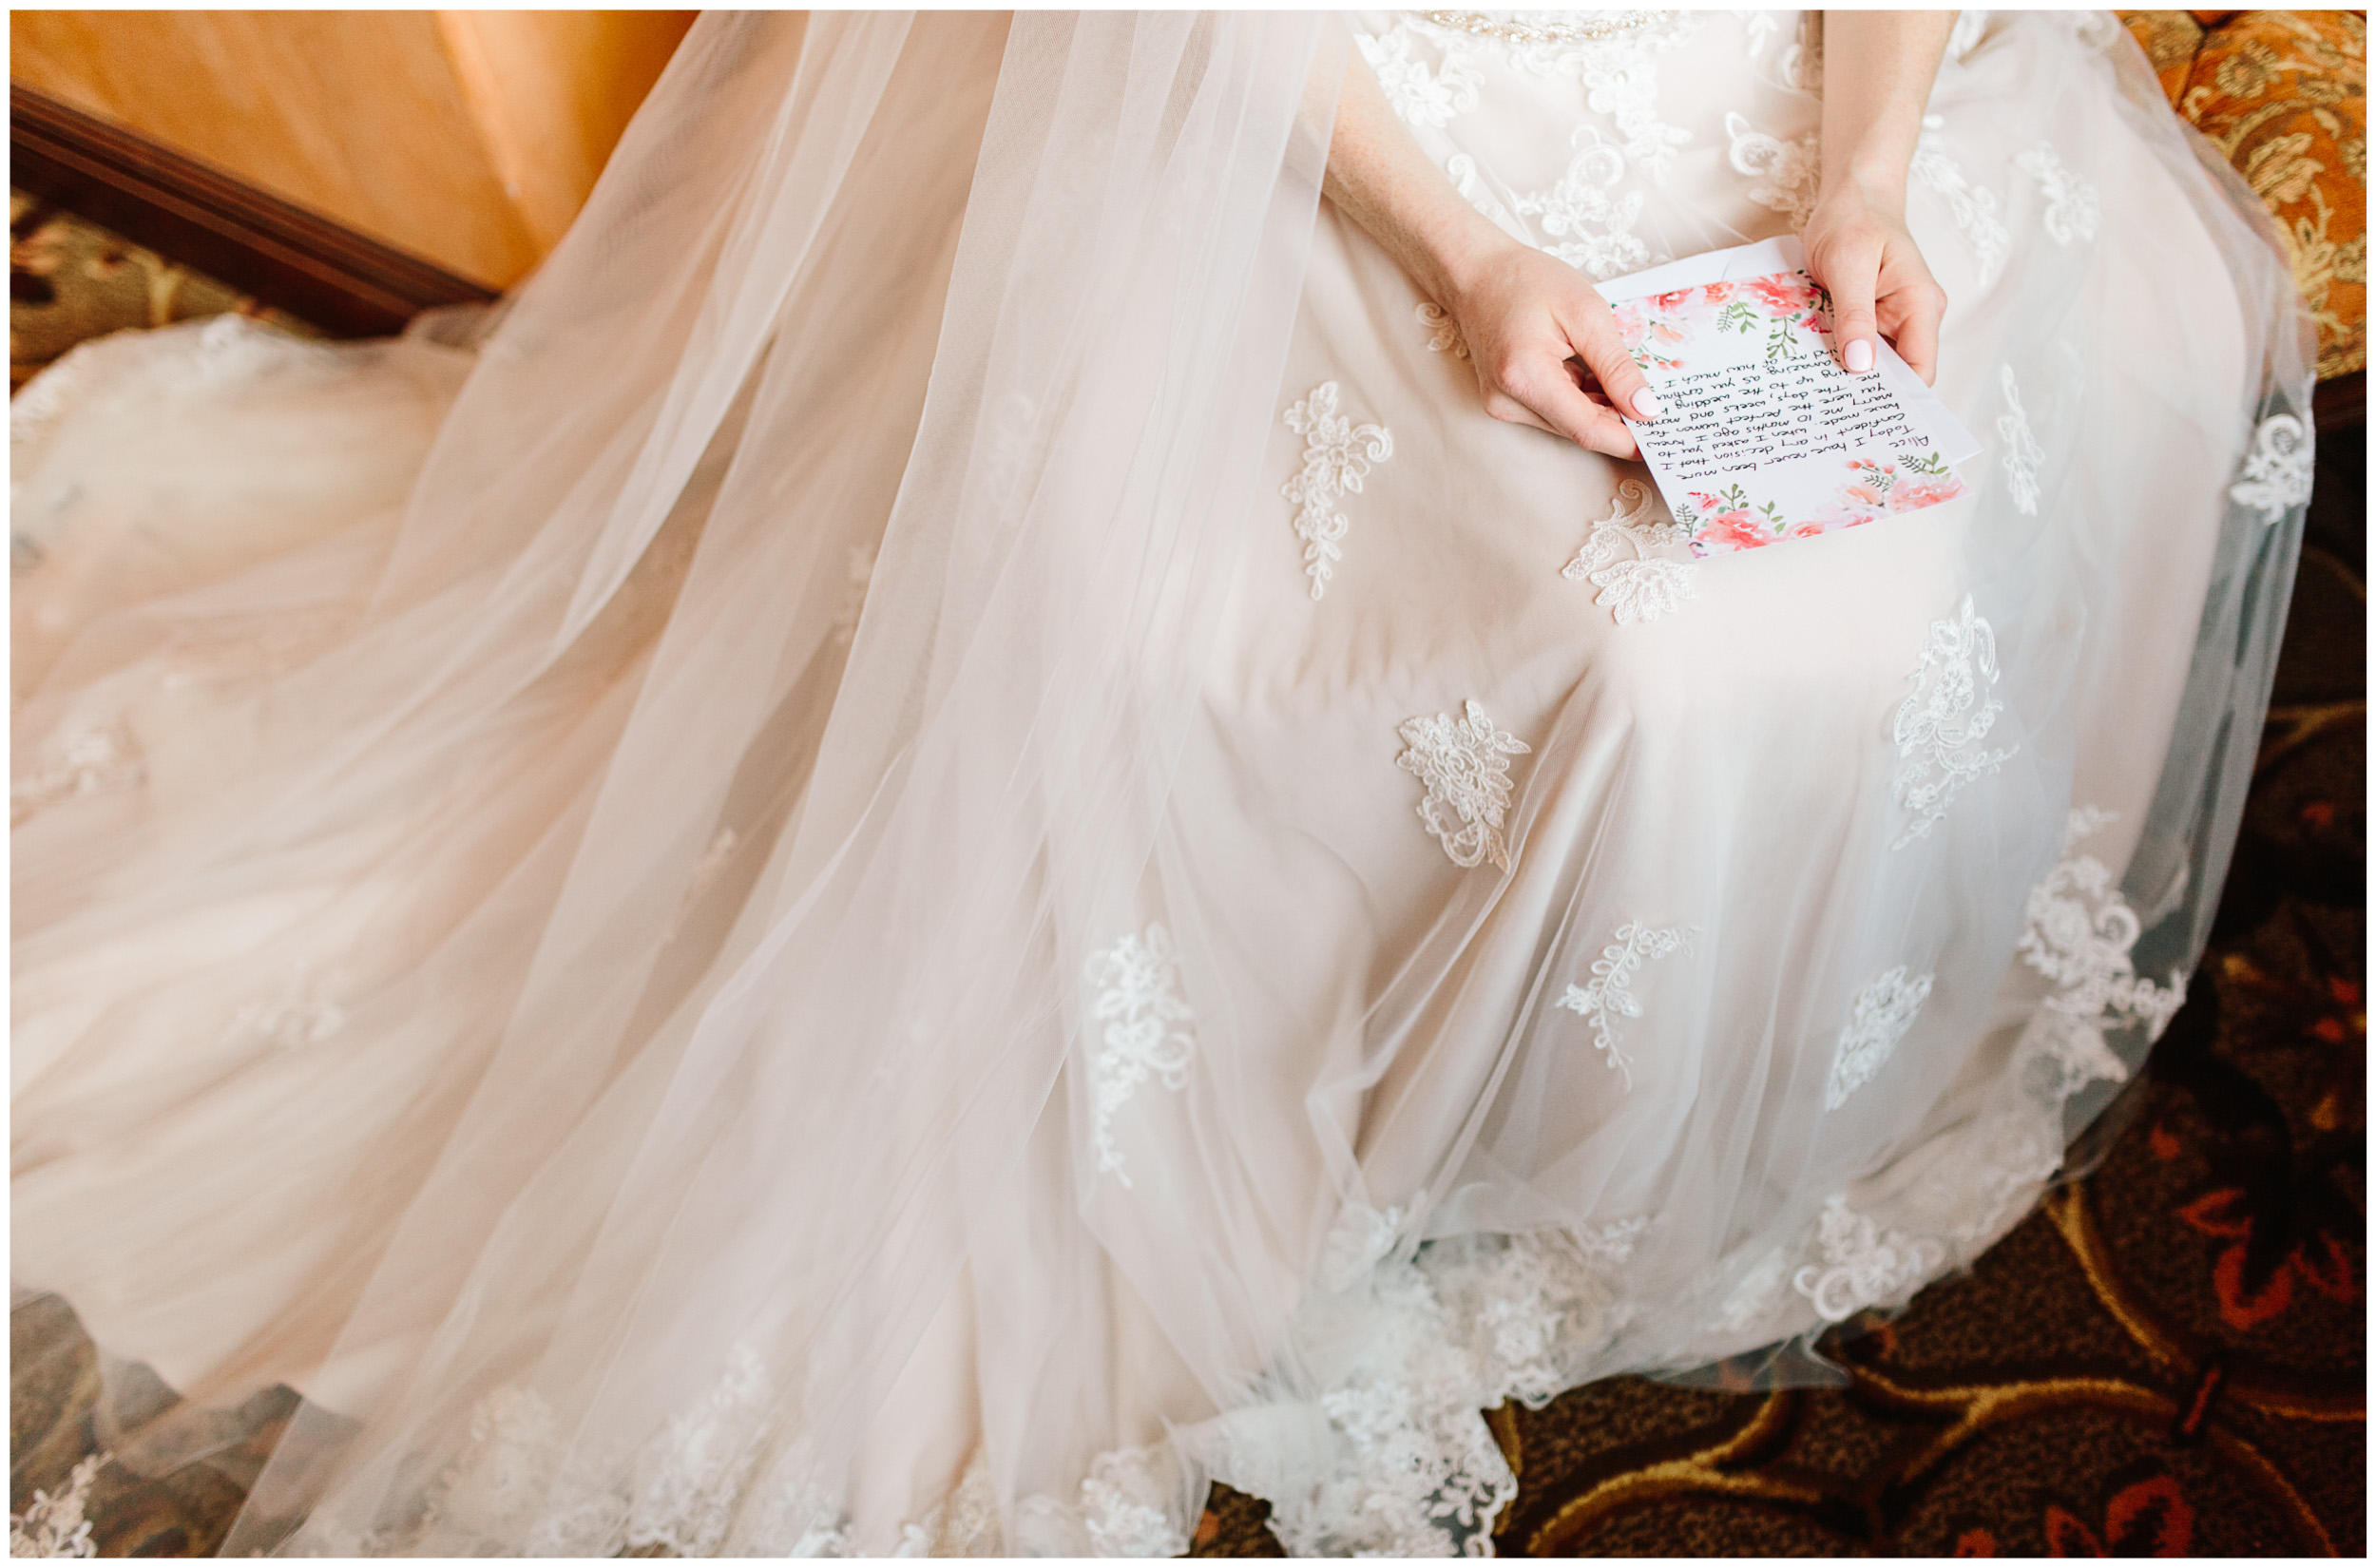 bella_collina_wedding_16.jpg